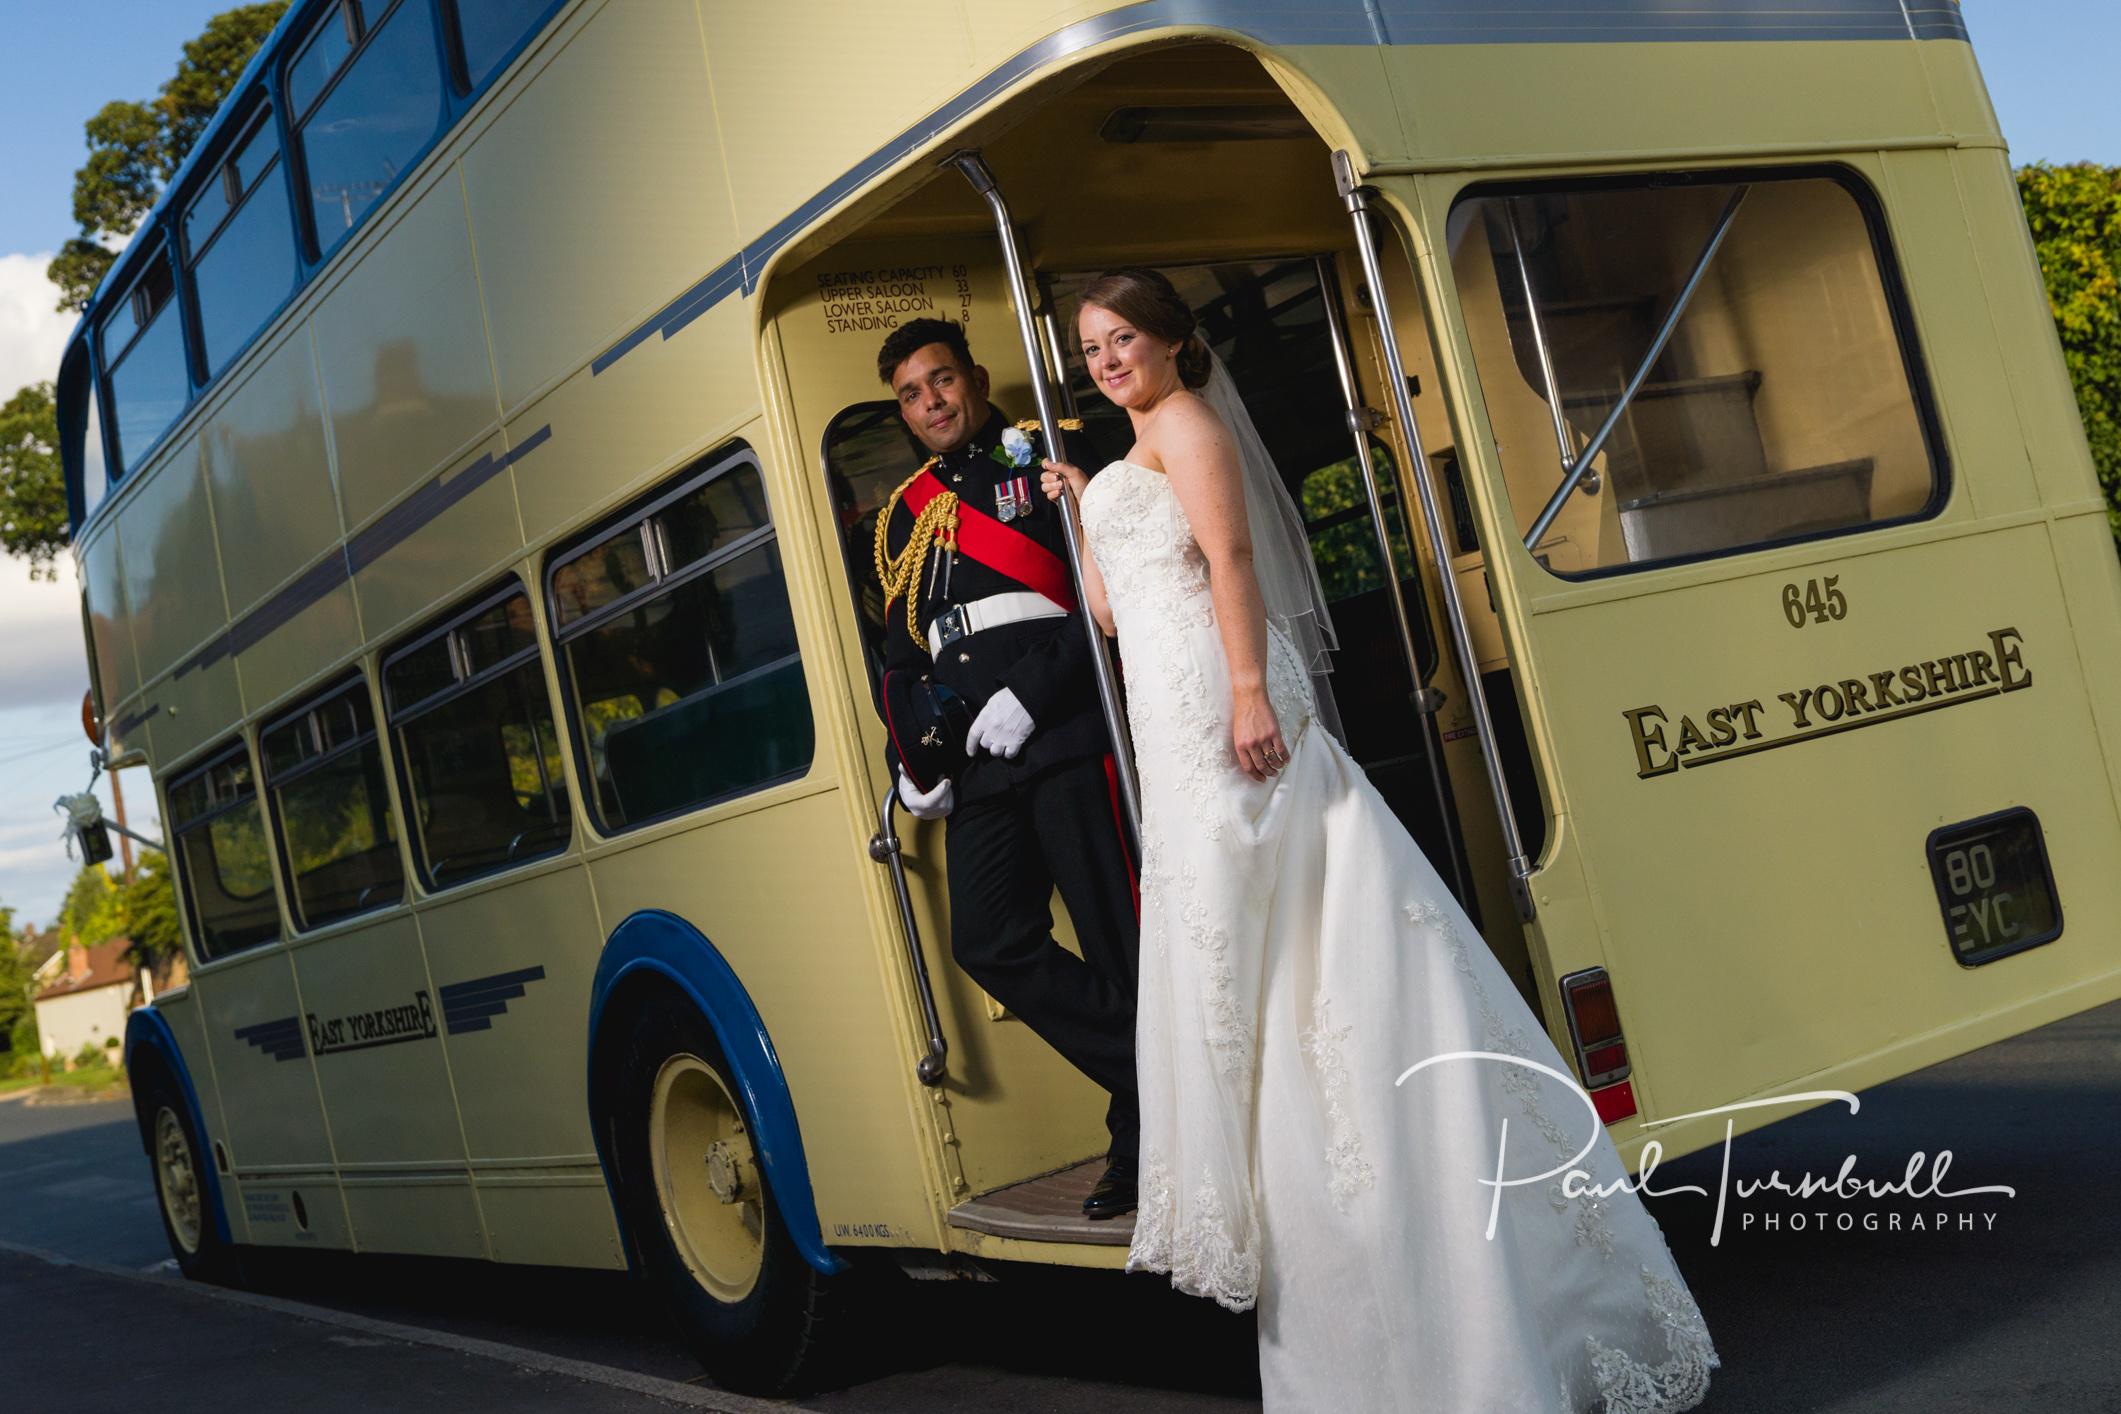 Emma & James - South Dalton, East Riding of Yorkshire